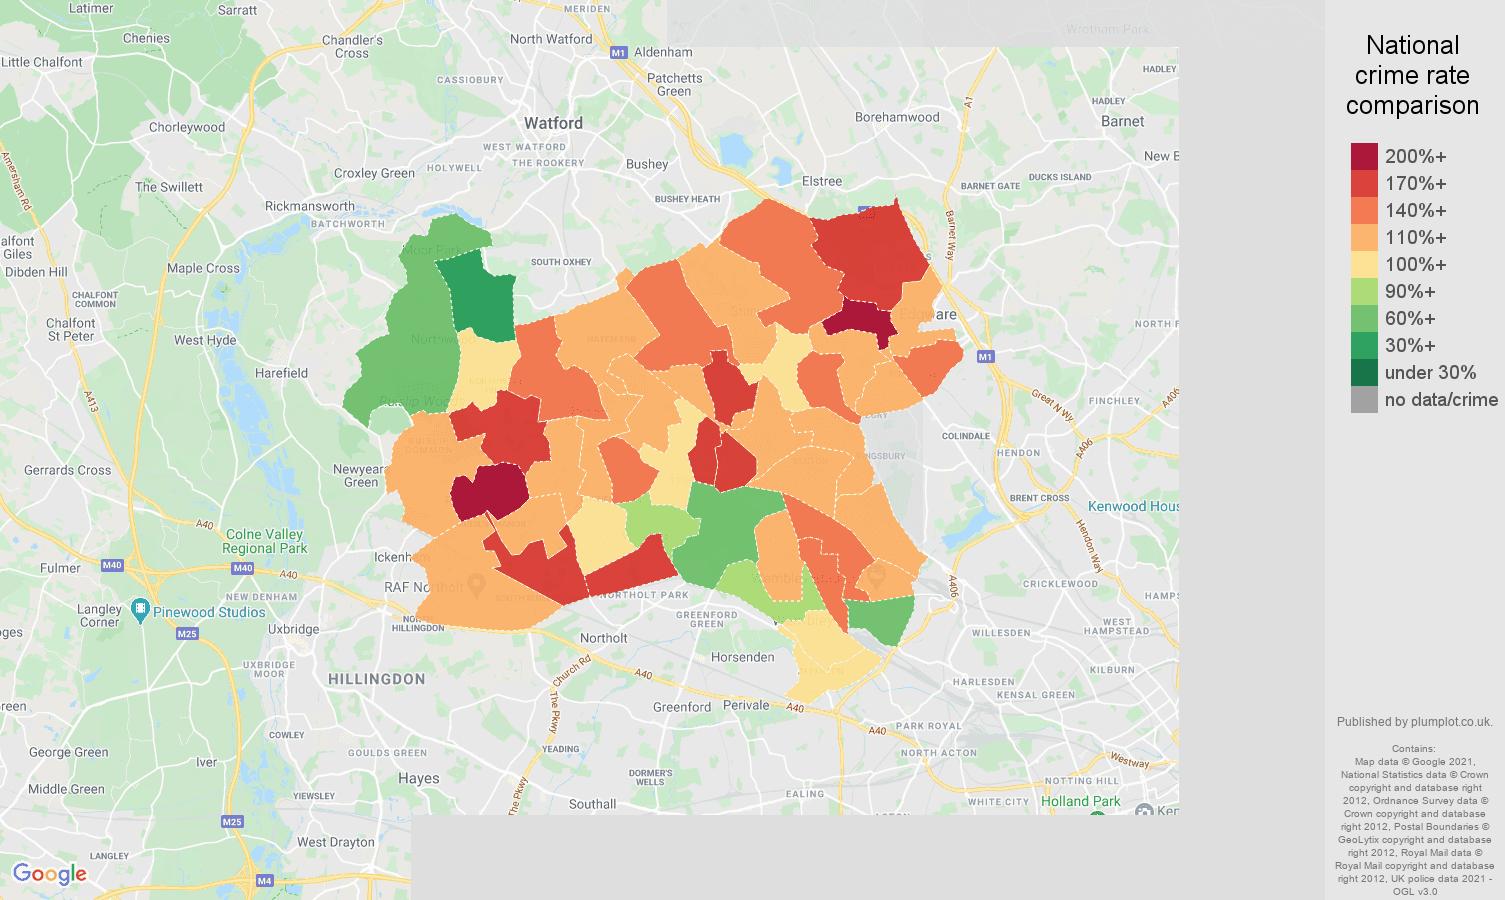 Harrow burglary crime rate comparison map